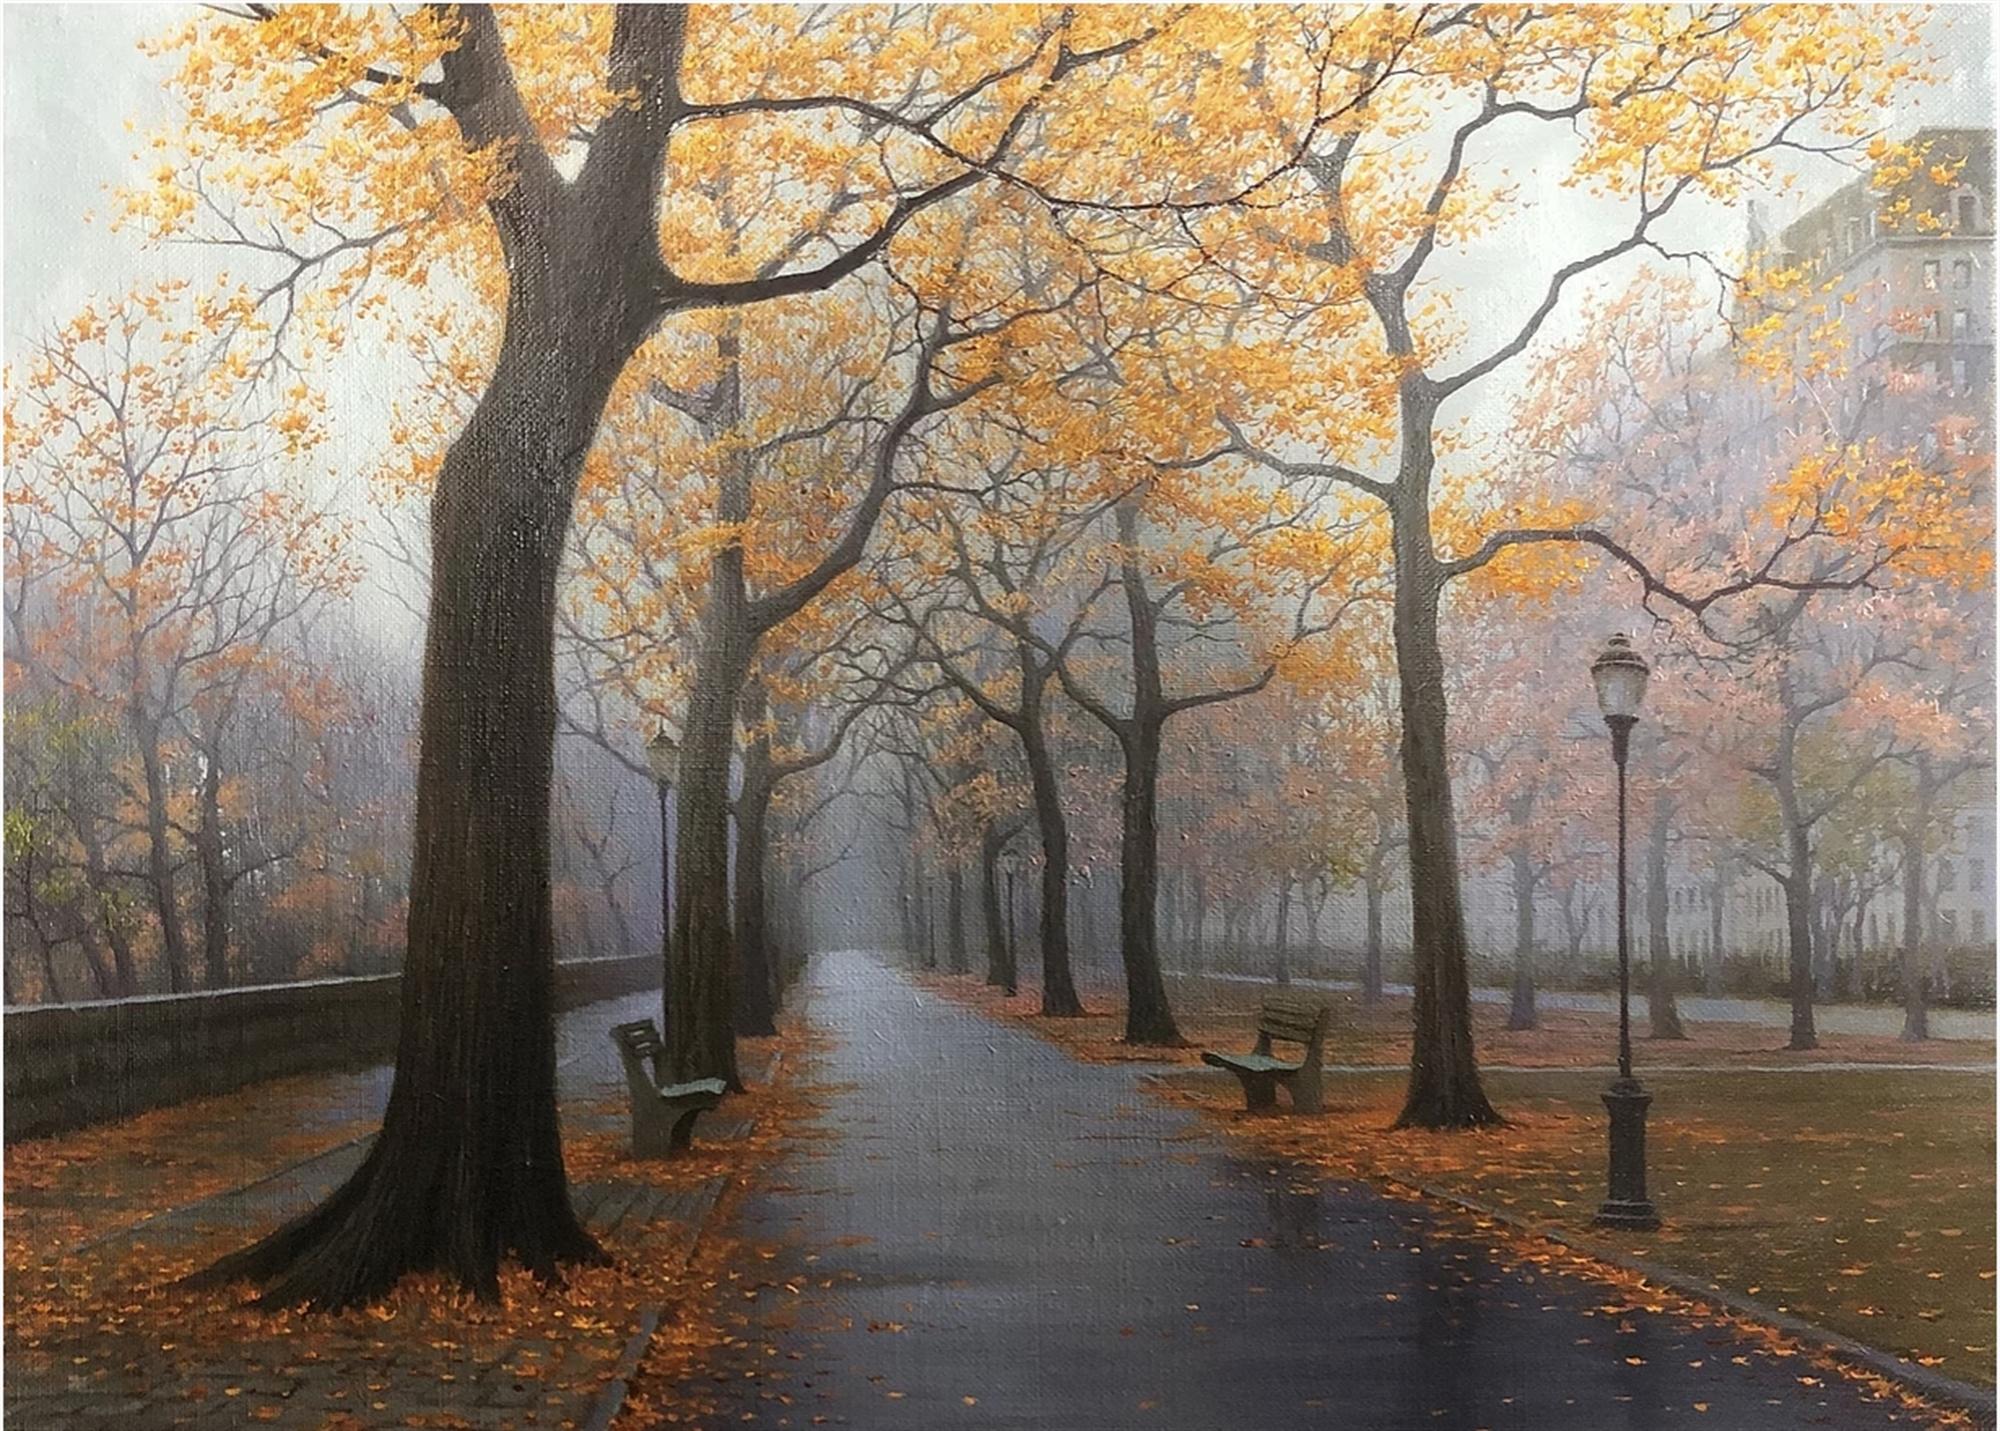 Autumn's Blanket by Alexei Butirskiy